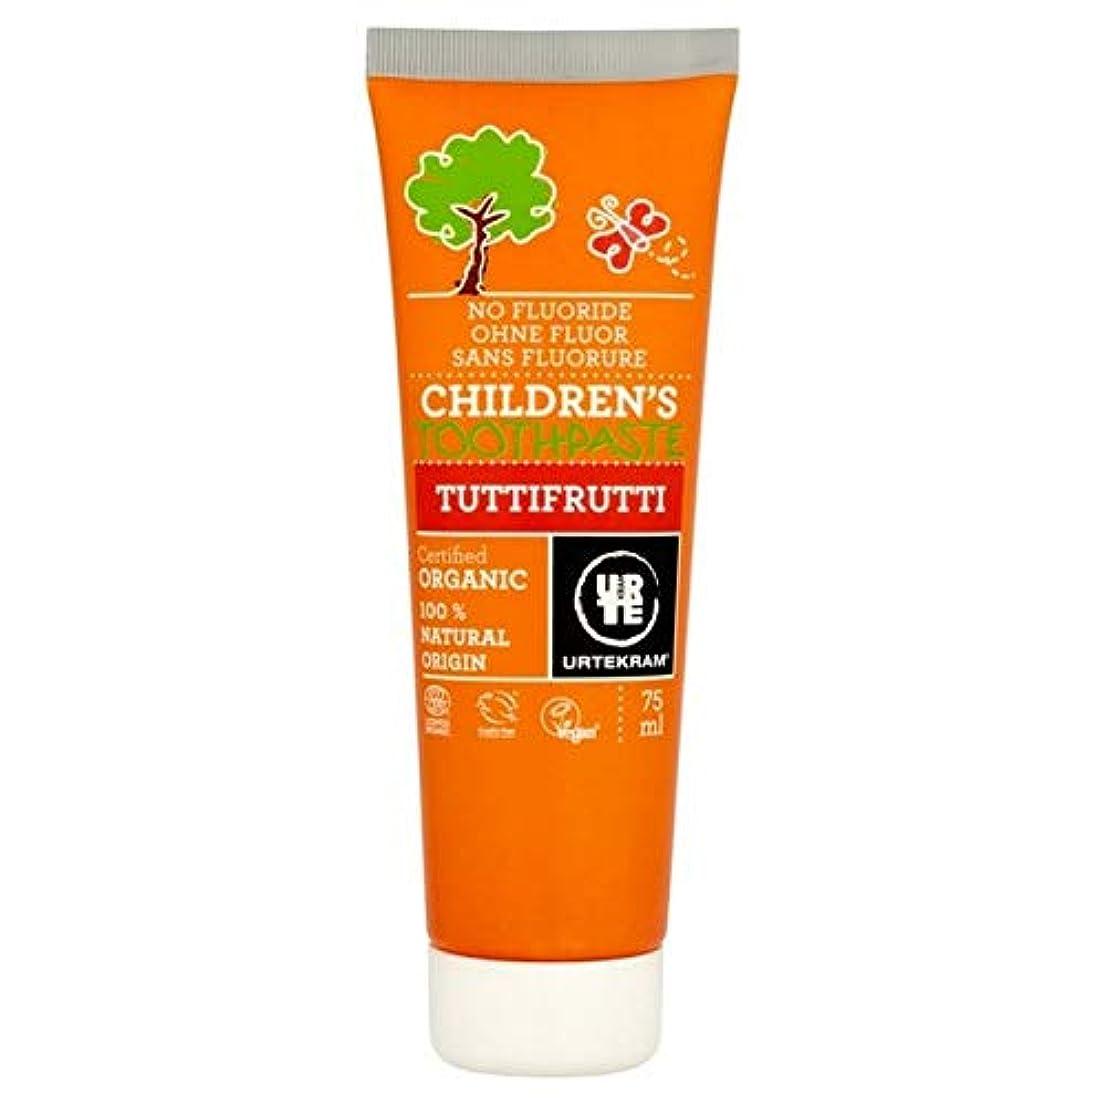 [Urtekram] Urtekram子供のトゥッティフルッティの歯磨き粉75ミリリットル - Urtekram Children's Tutti Frutti Toothpaste 75ml [並行輸入品]